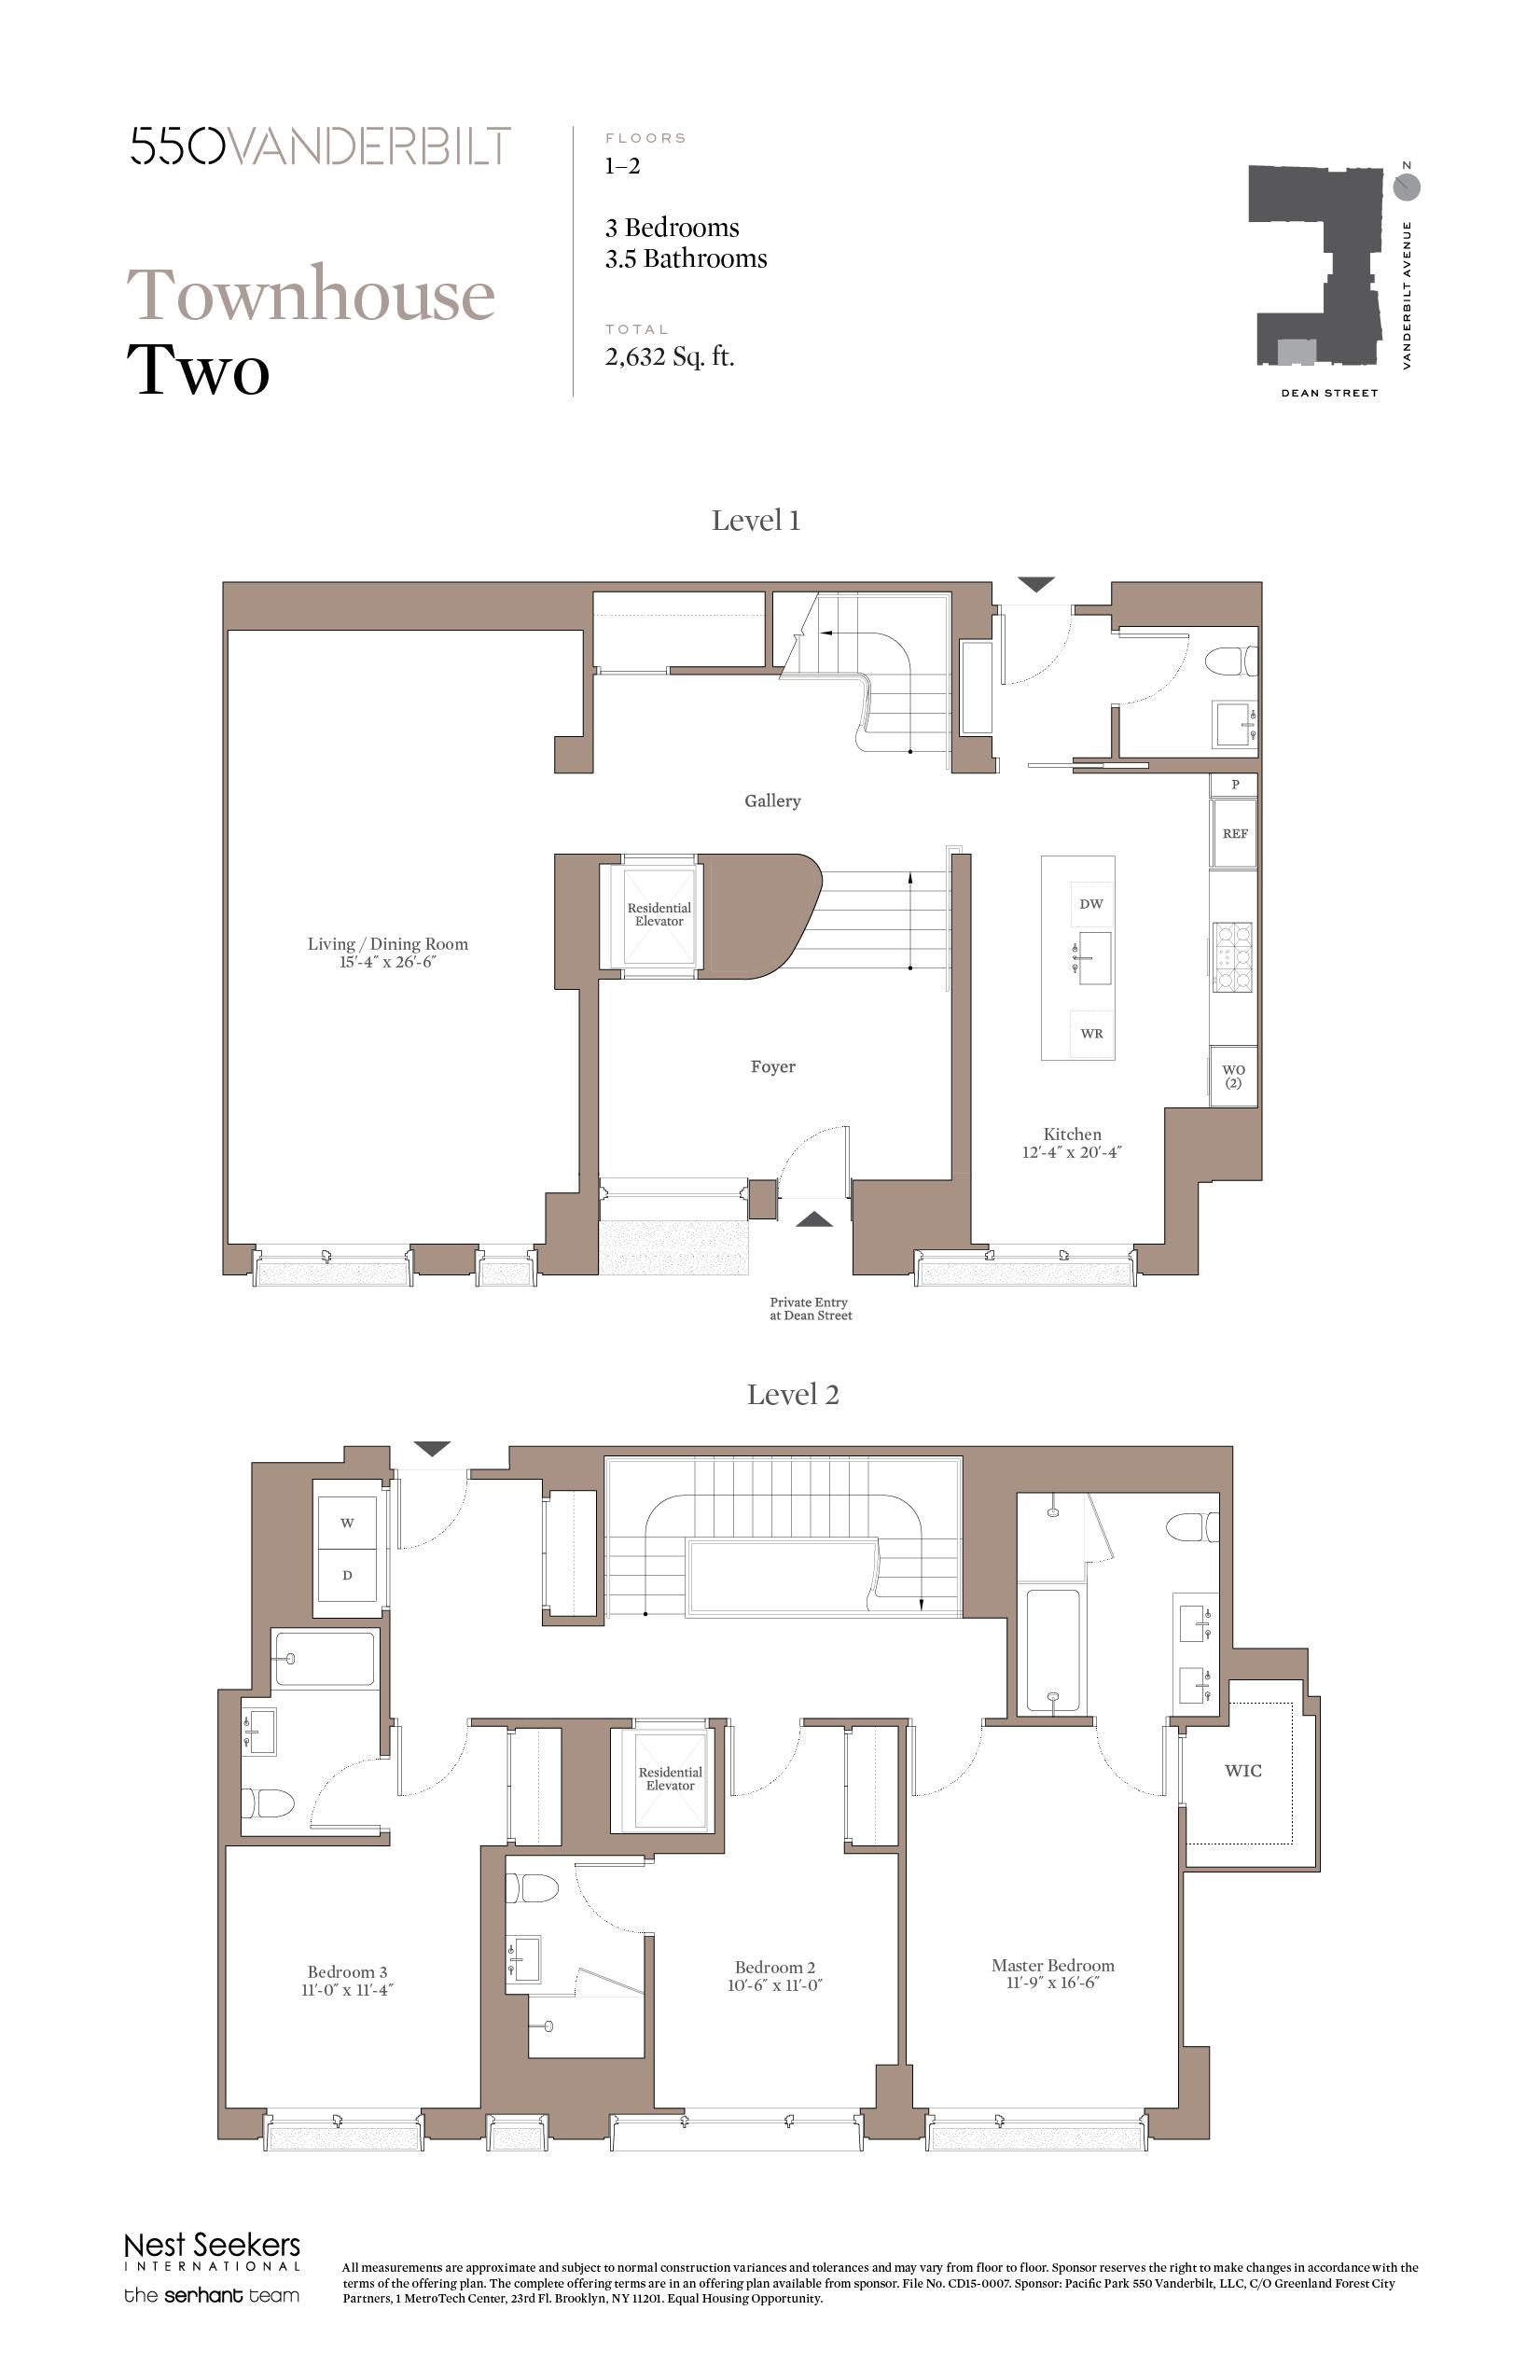 Re 550vanderbilt Townhouse Two Residential Building Plan City Living Apartment House Plans